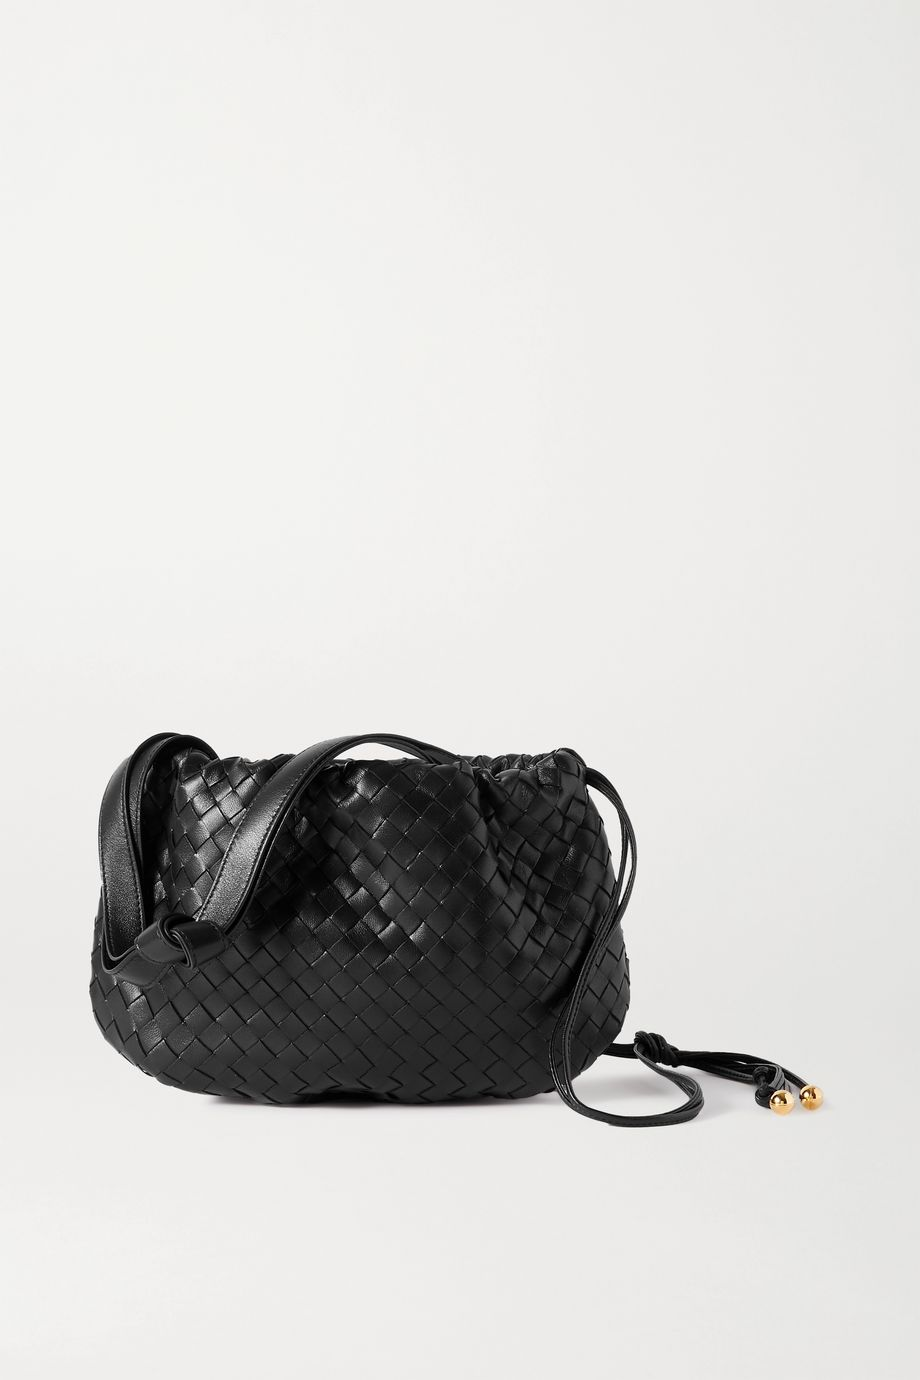 Bottega Veneta The Small Bulb gathered intrecciato leather shoulder bag